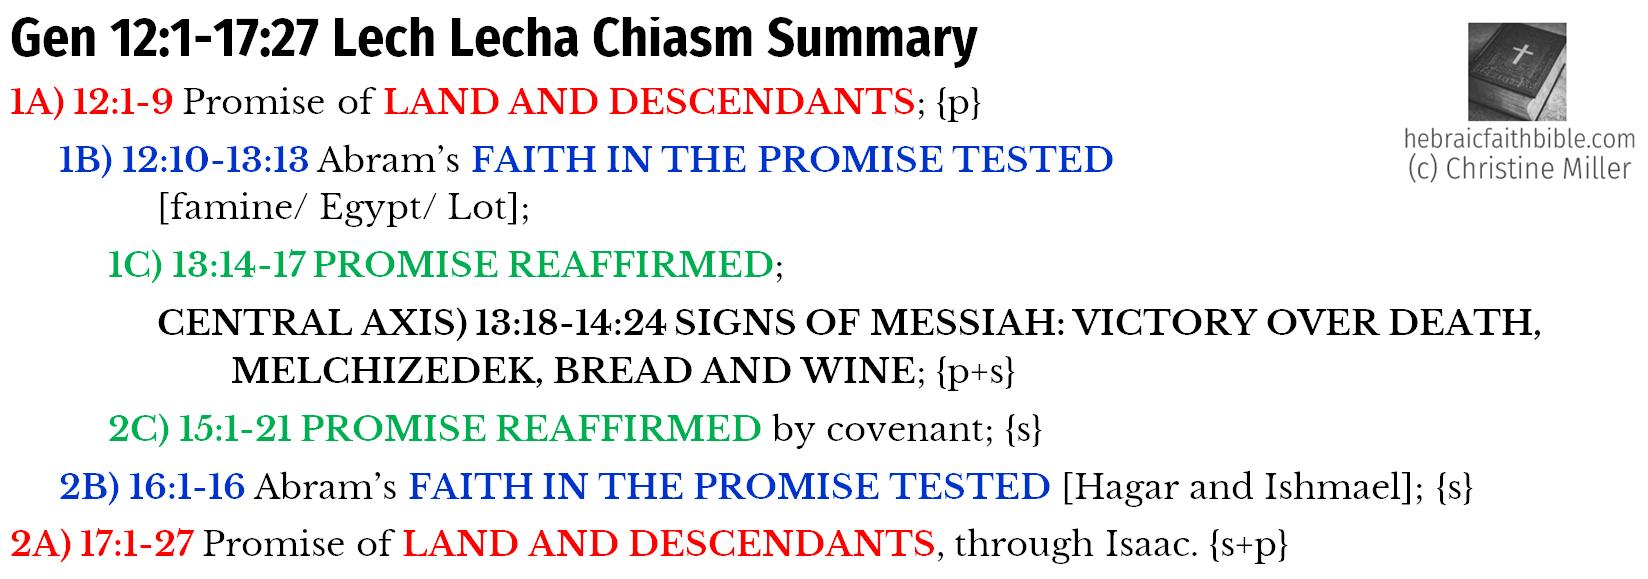 Gen 12:1-17:27 Lecha lecha chiasm summary   hebraicfaithbible.com